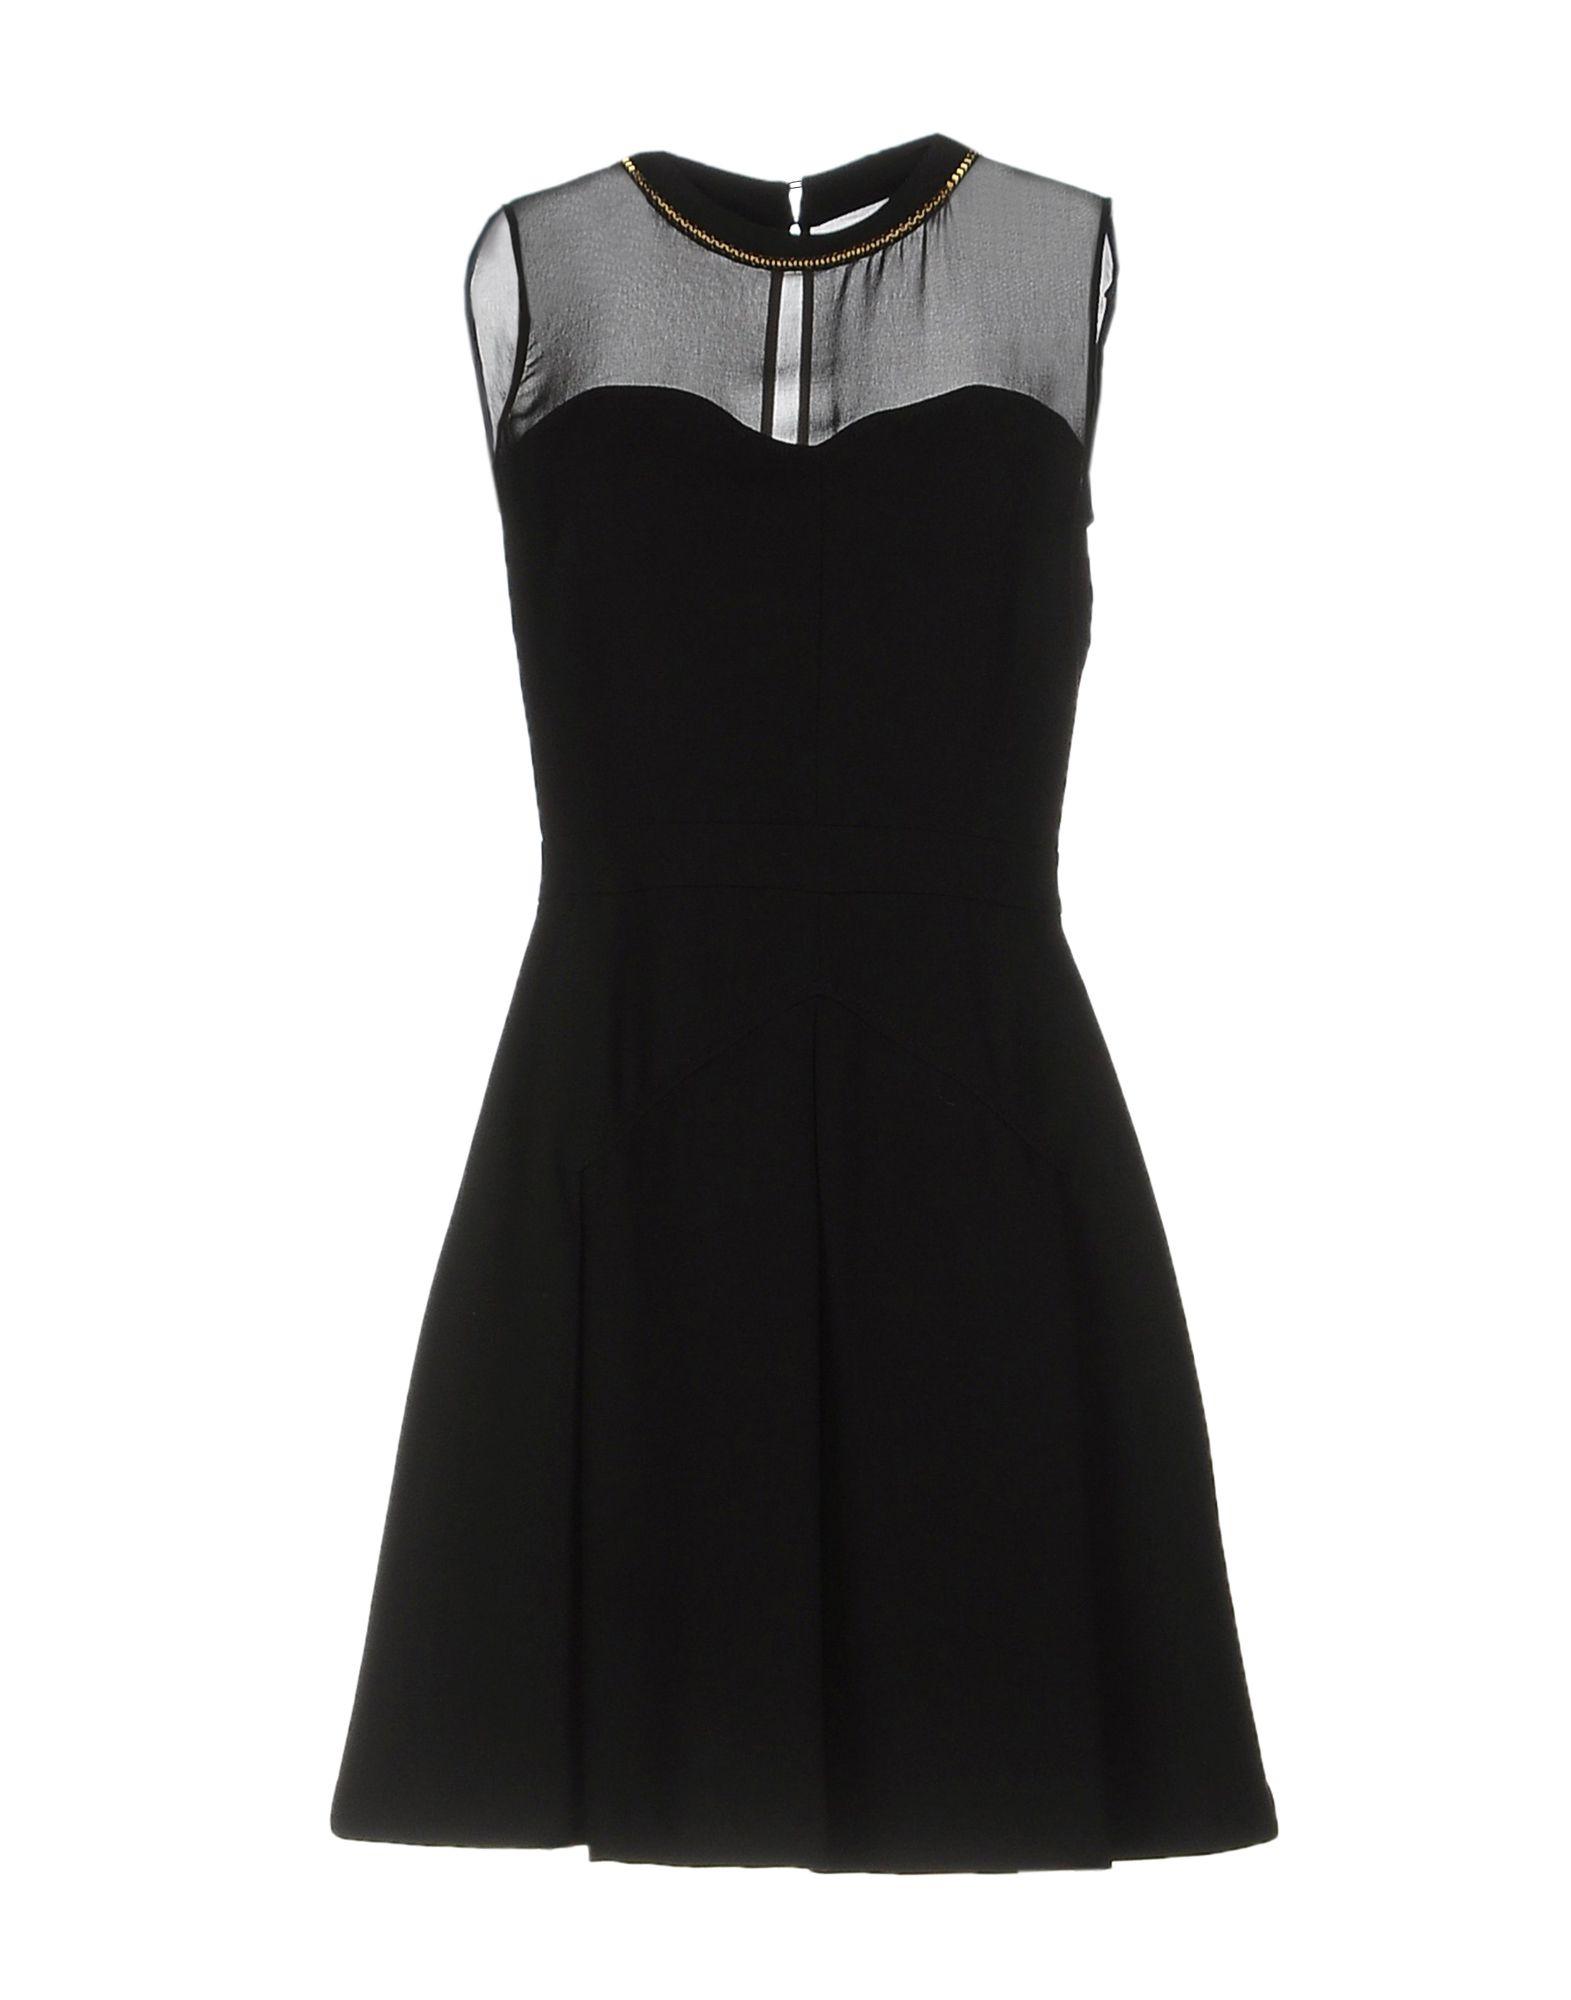 BETTY BLUE Короткое платье коньки onlitop 223f 37 40 blue 806164